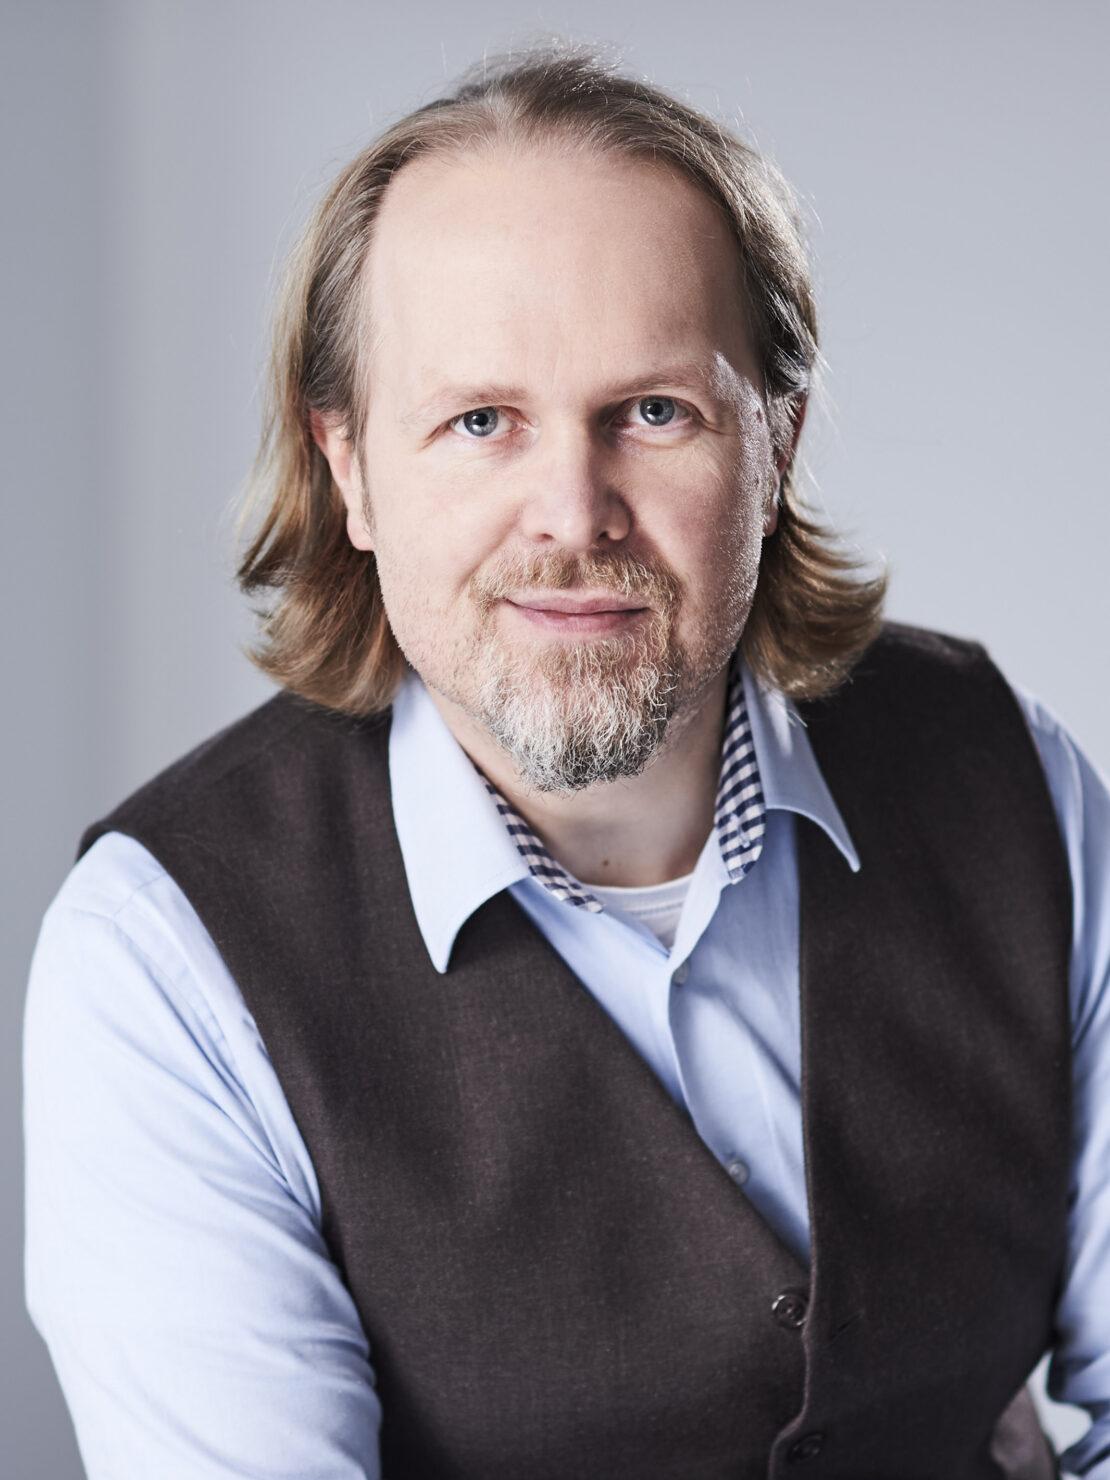 Frank Köhne